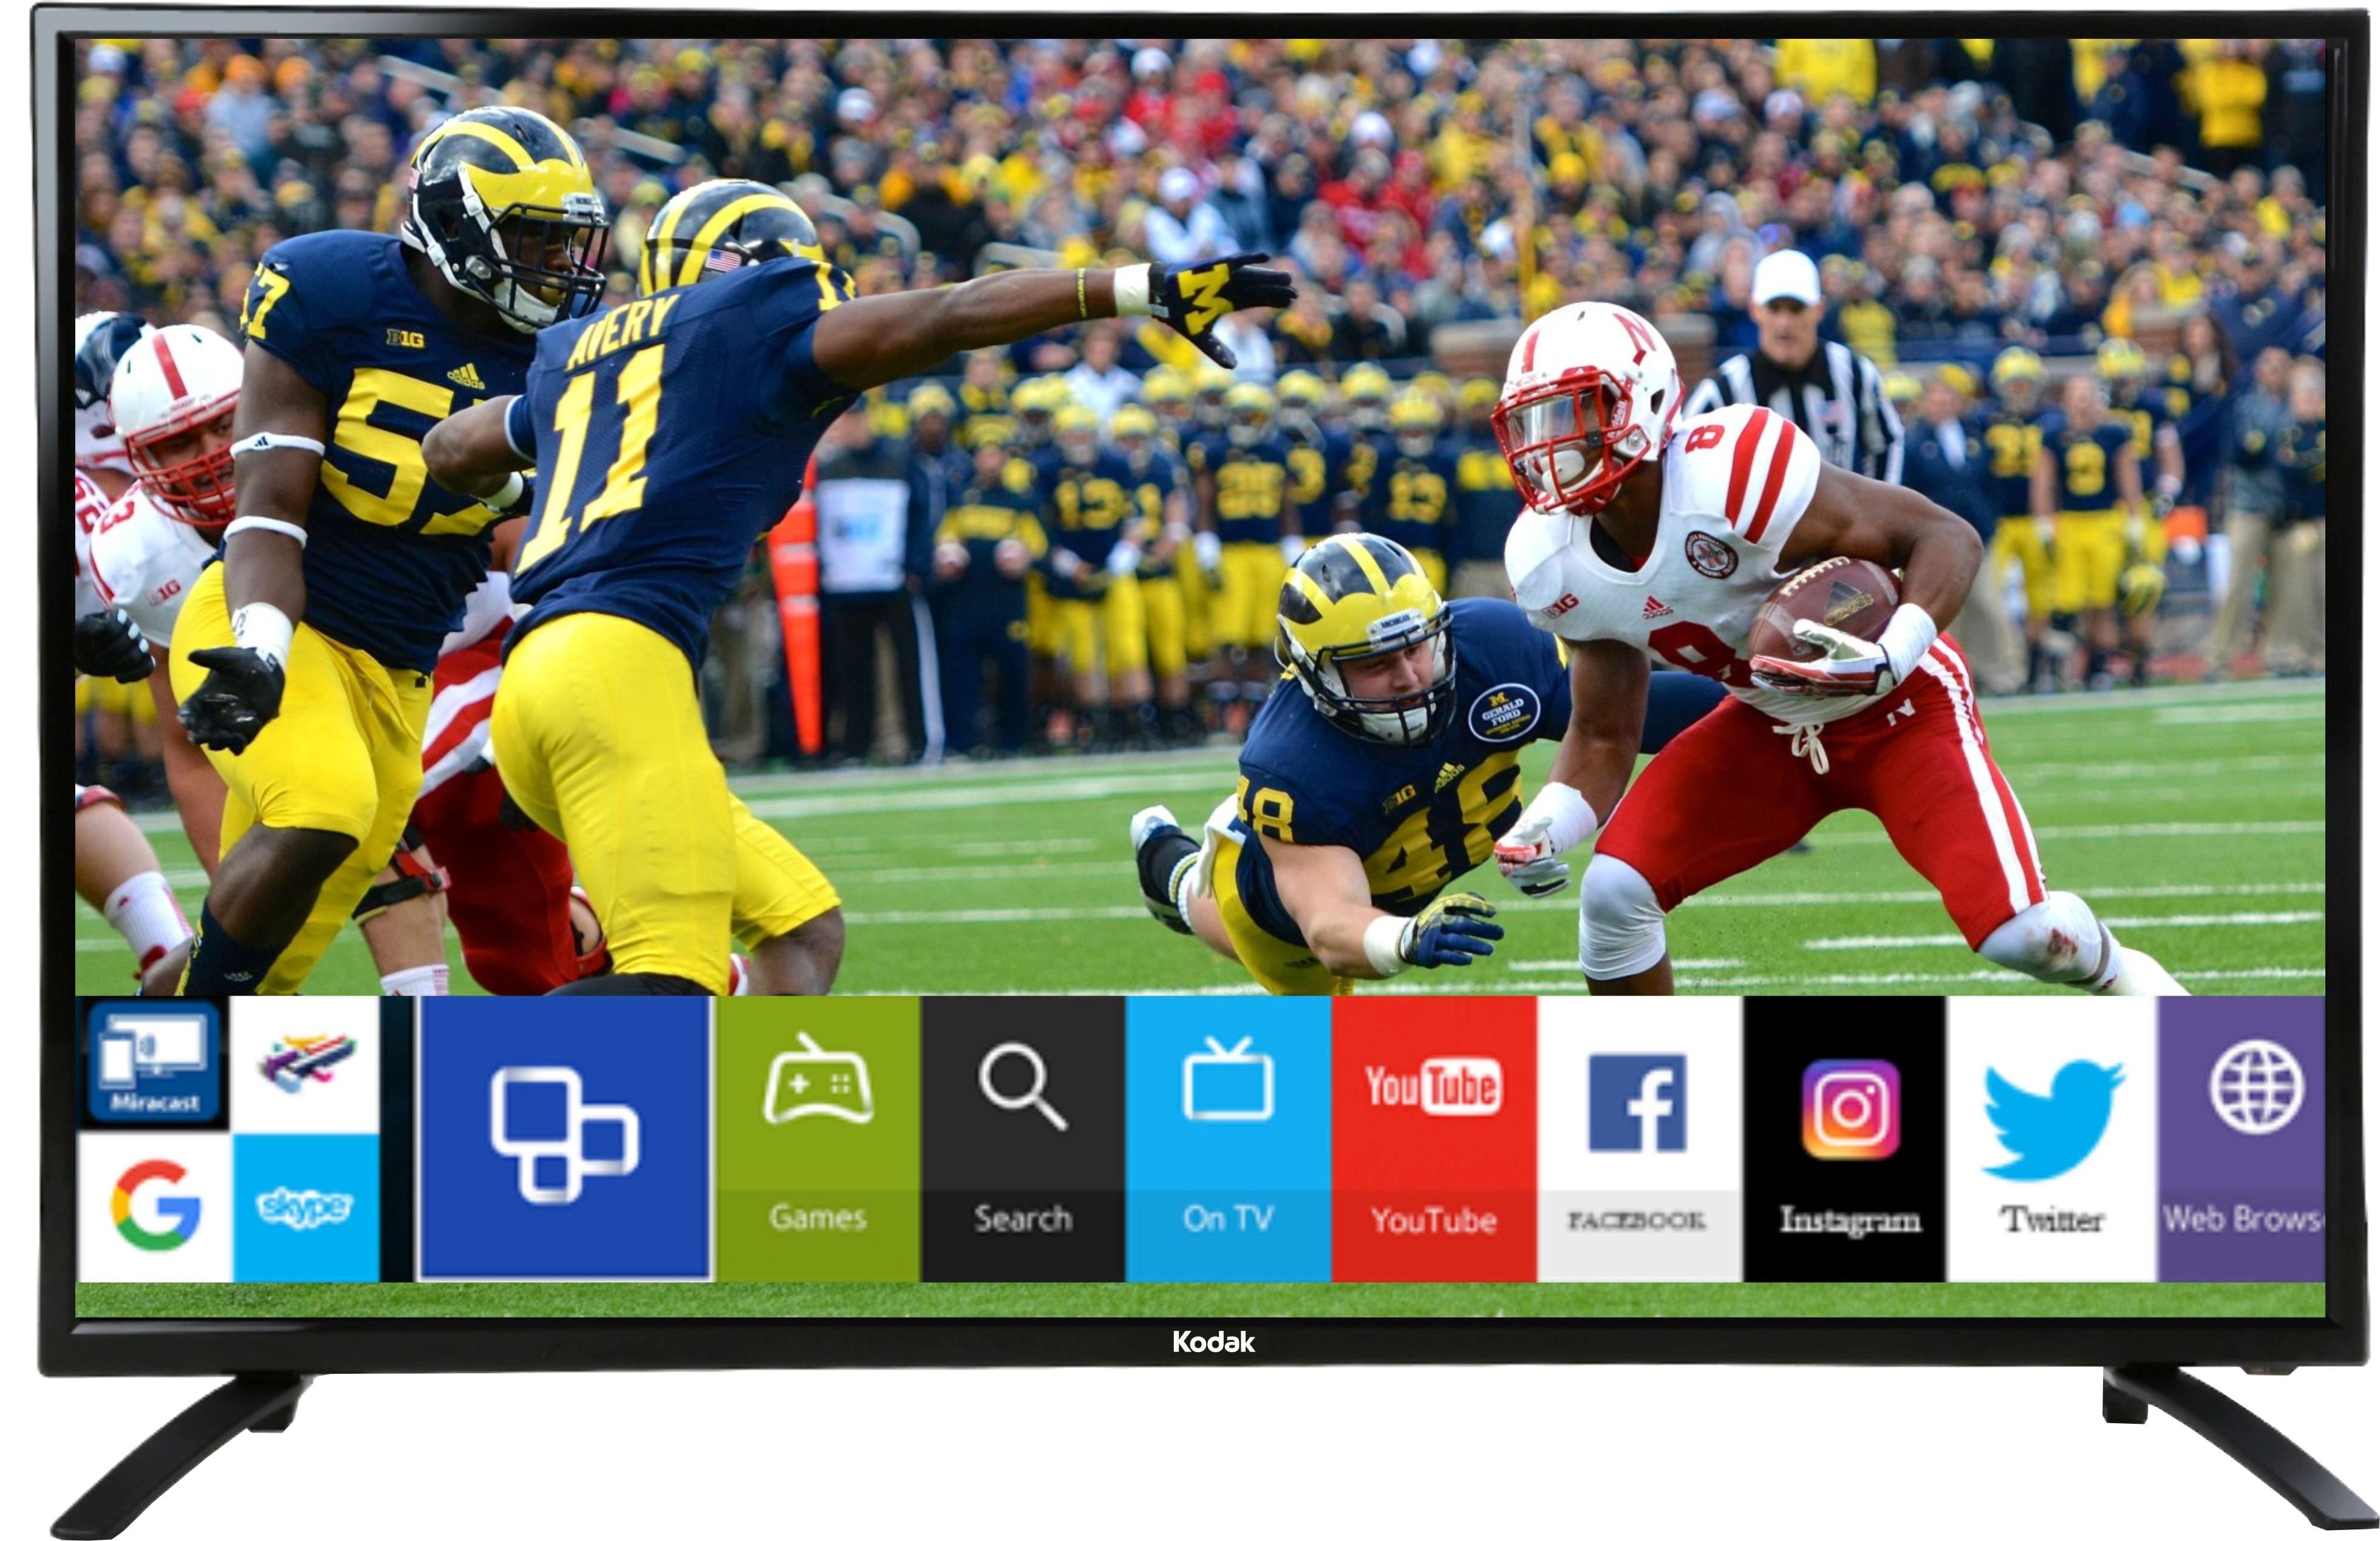 KODAK 50FHDXSMART 50 Inches Full HD LED TV